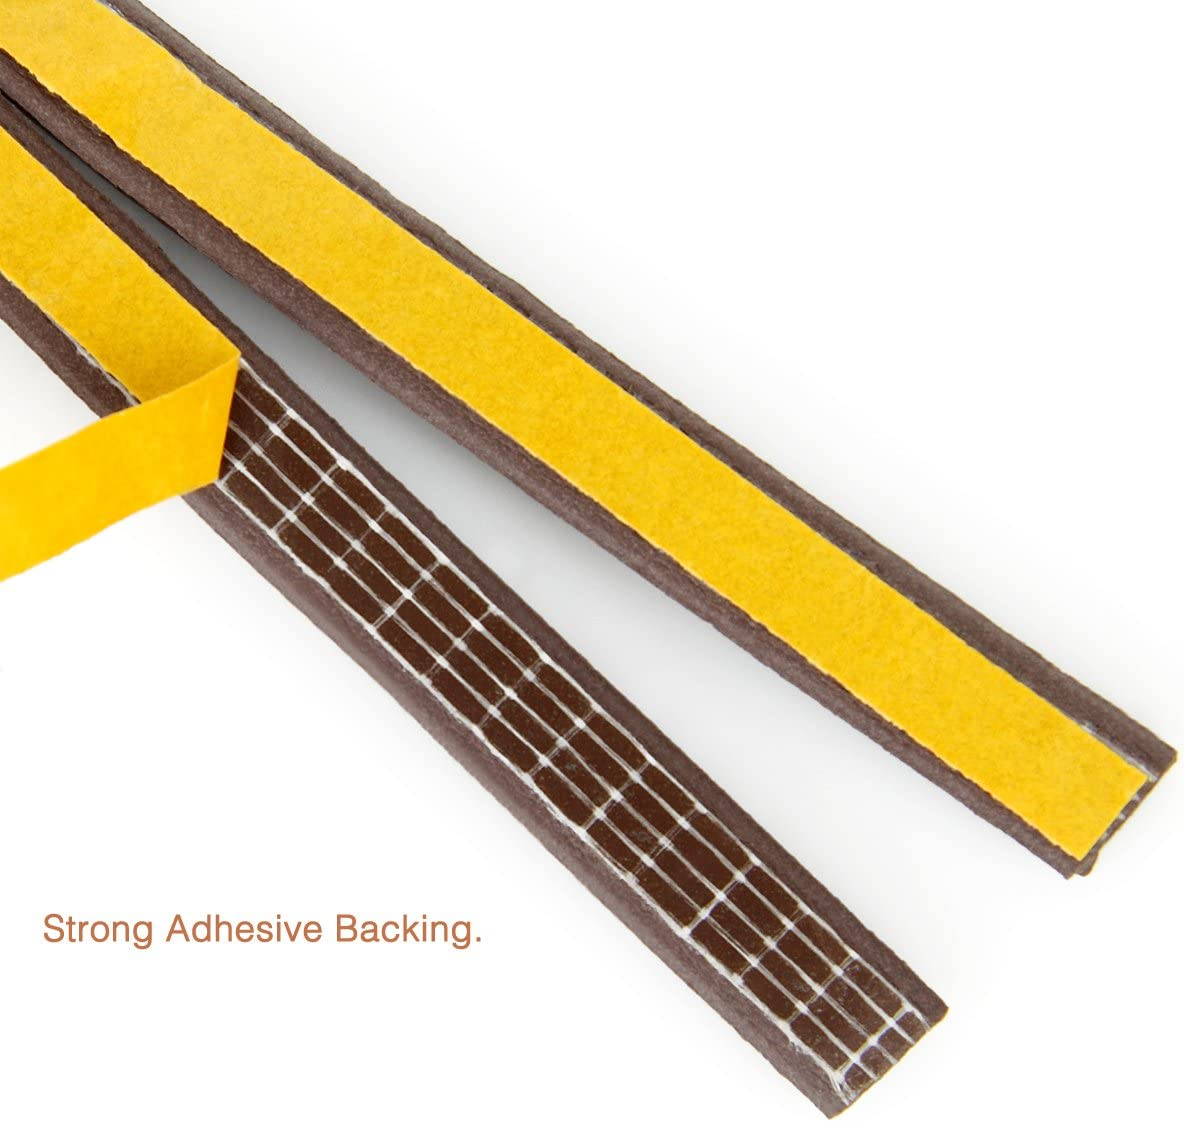 Collision Avoidance D Brown Dustproof Weather Stripping,Door Window Adhesive Seal Strips for Windproof Soundproof Weatherproof Seal 50 Feet